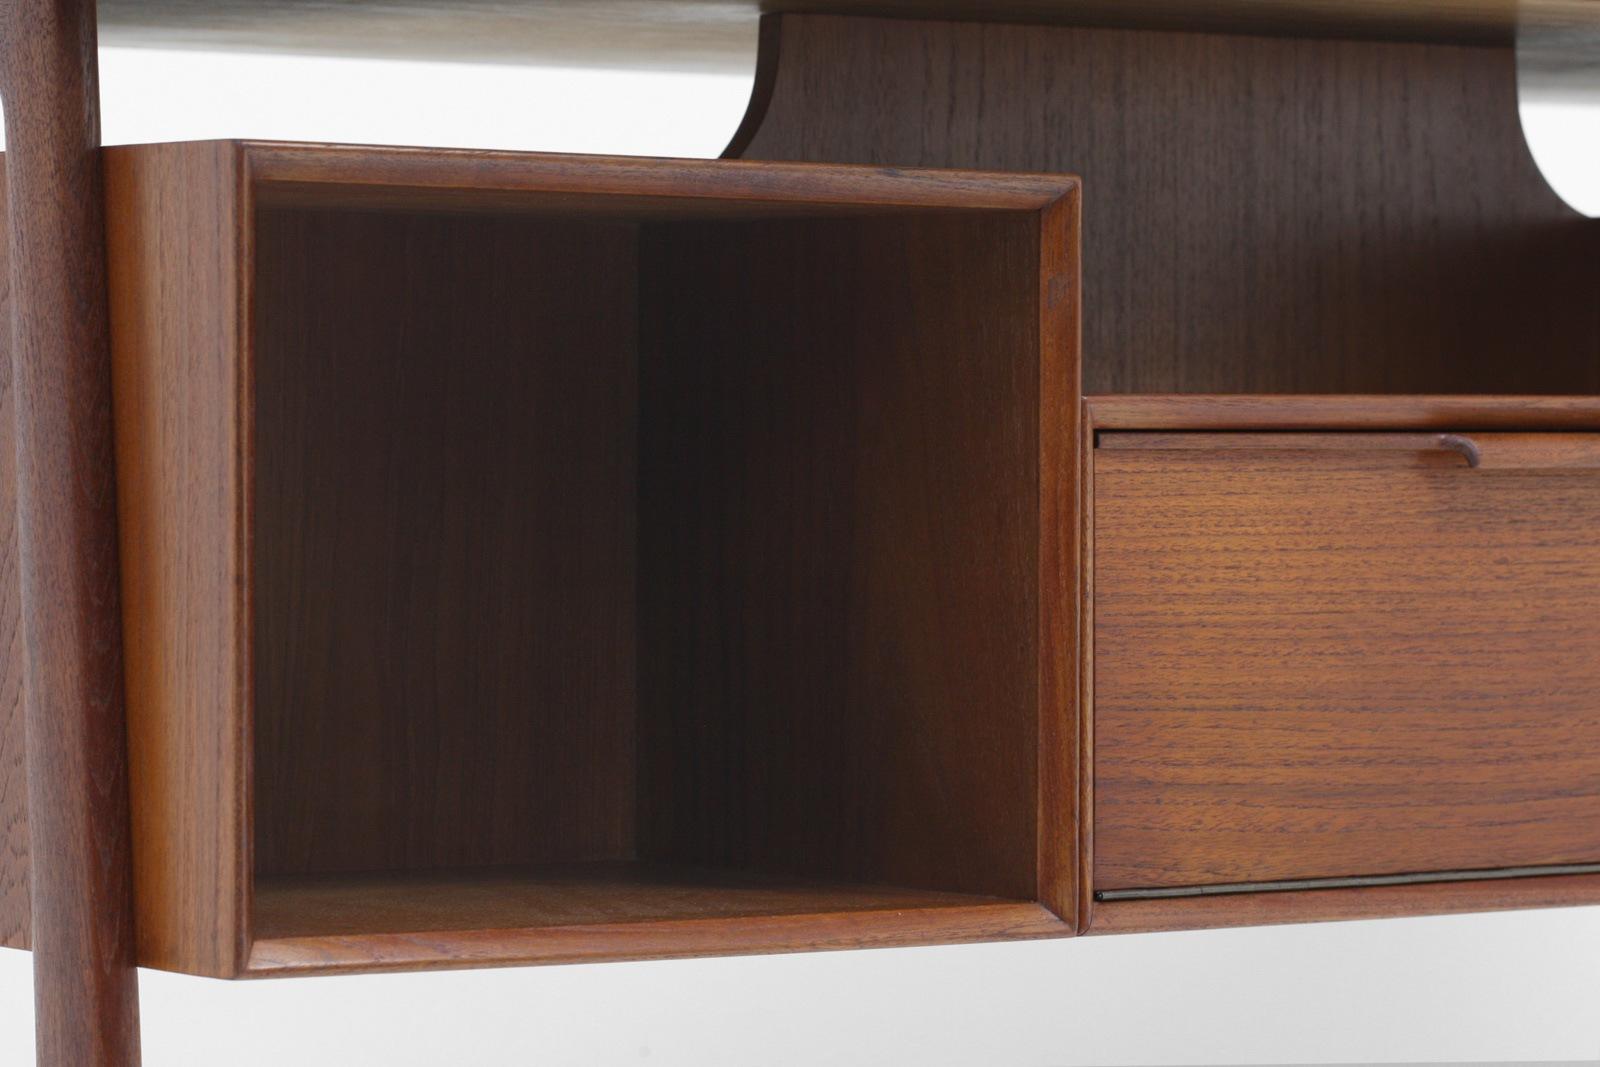 OMANNJUN,オーマンジュン,model75,両袖,デスク,北欧,家具